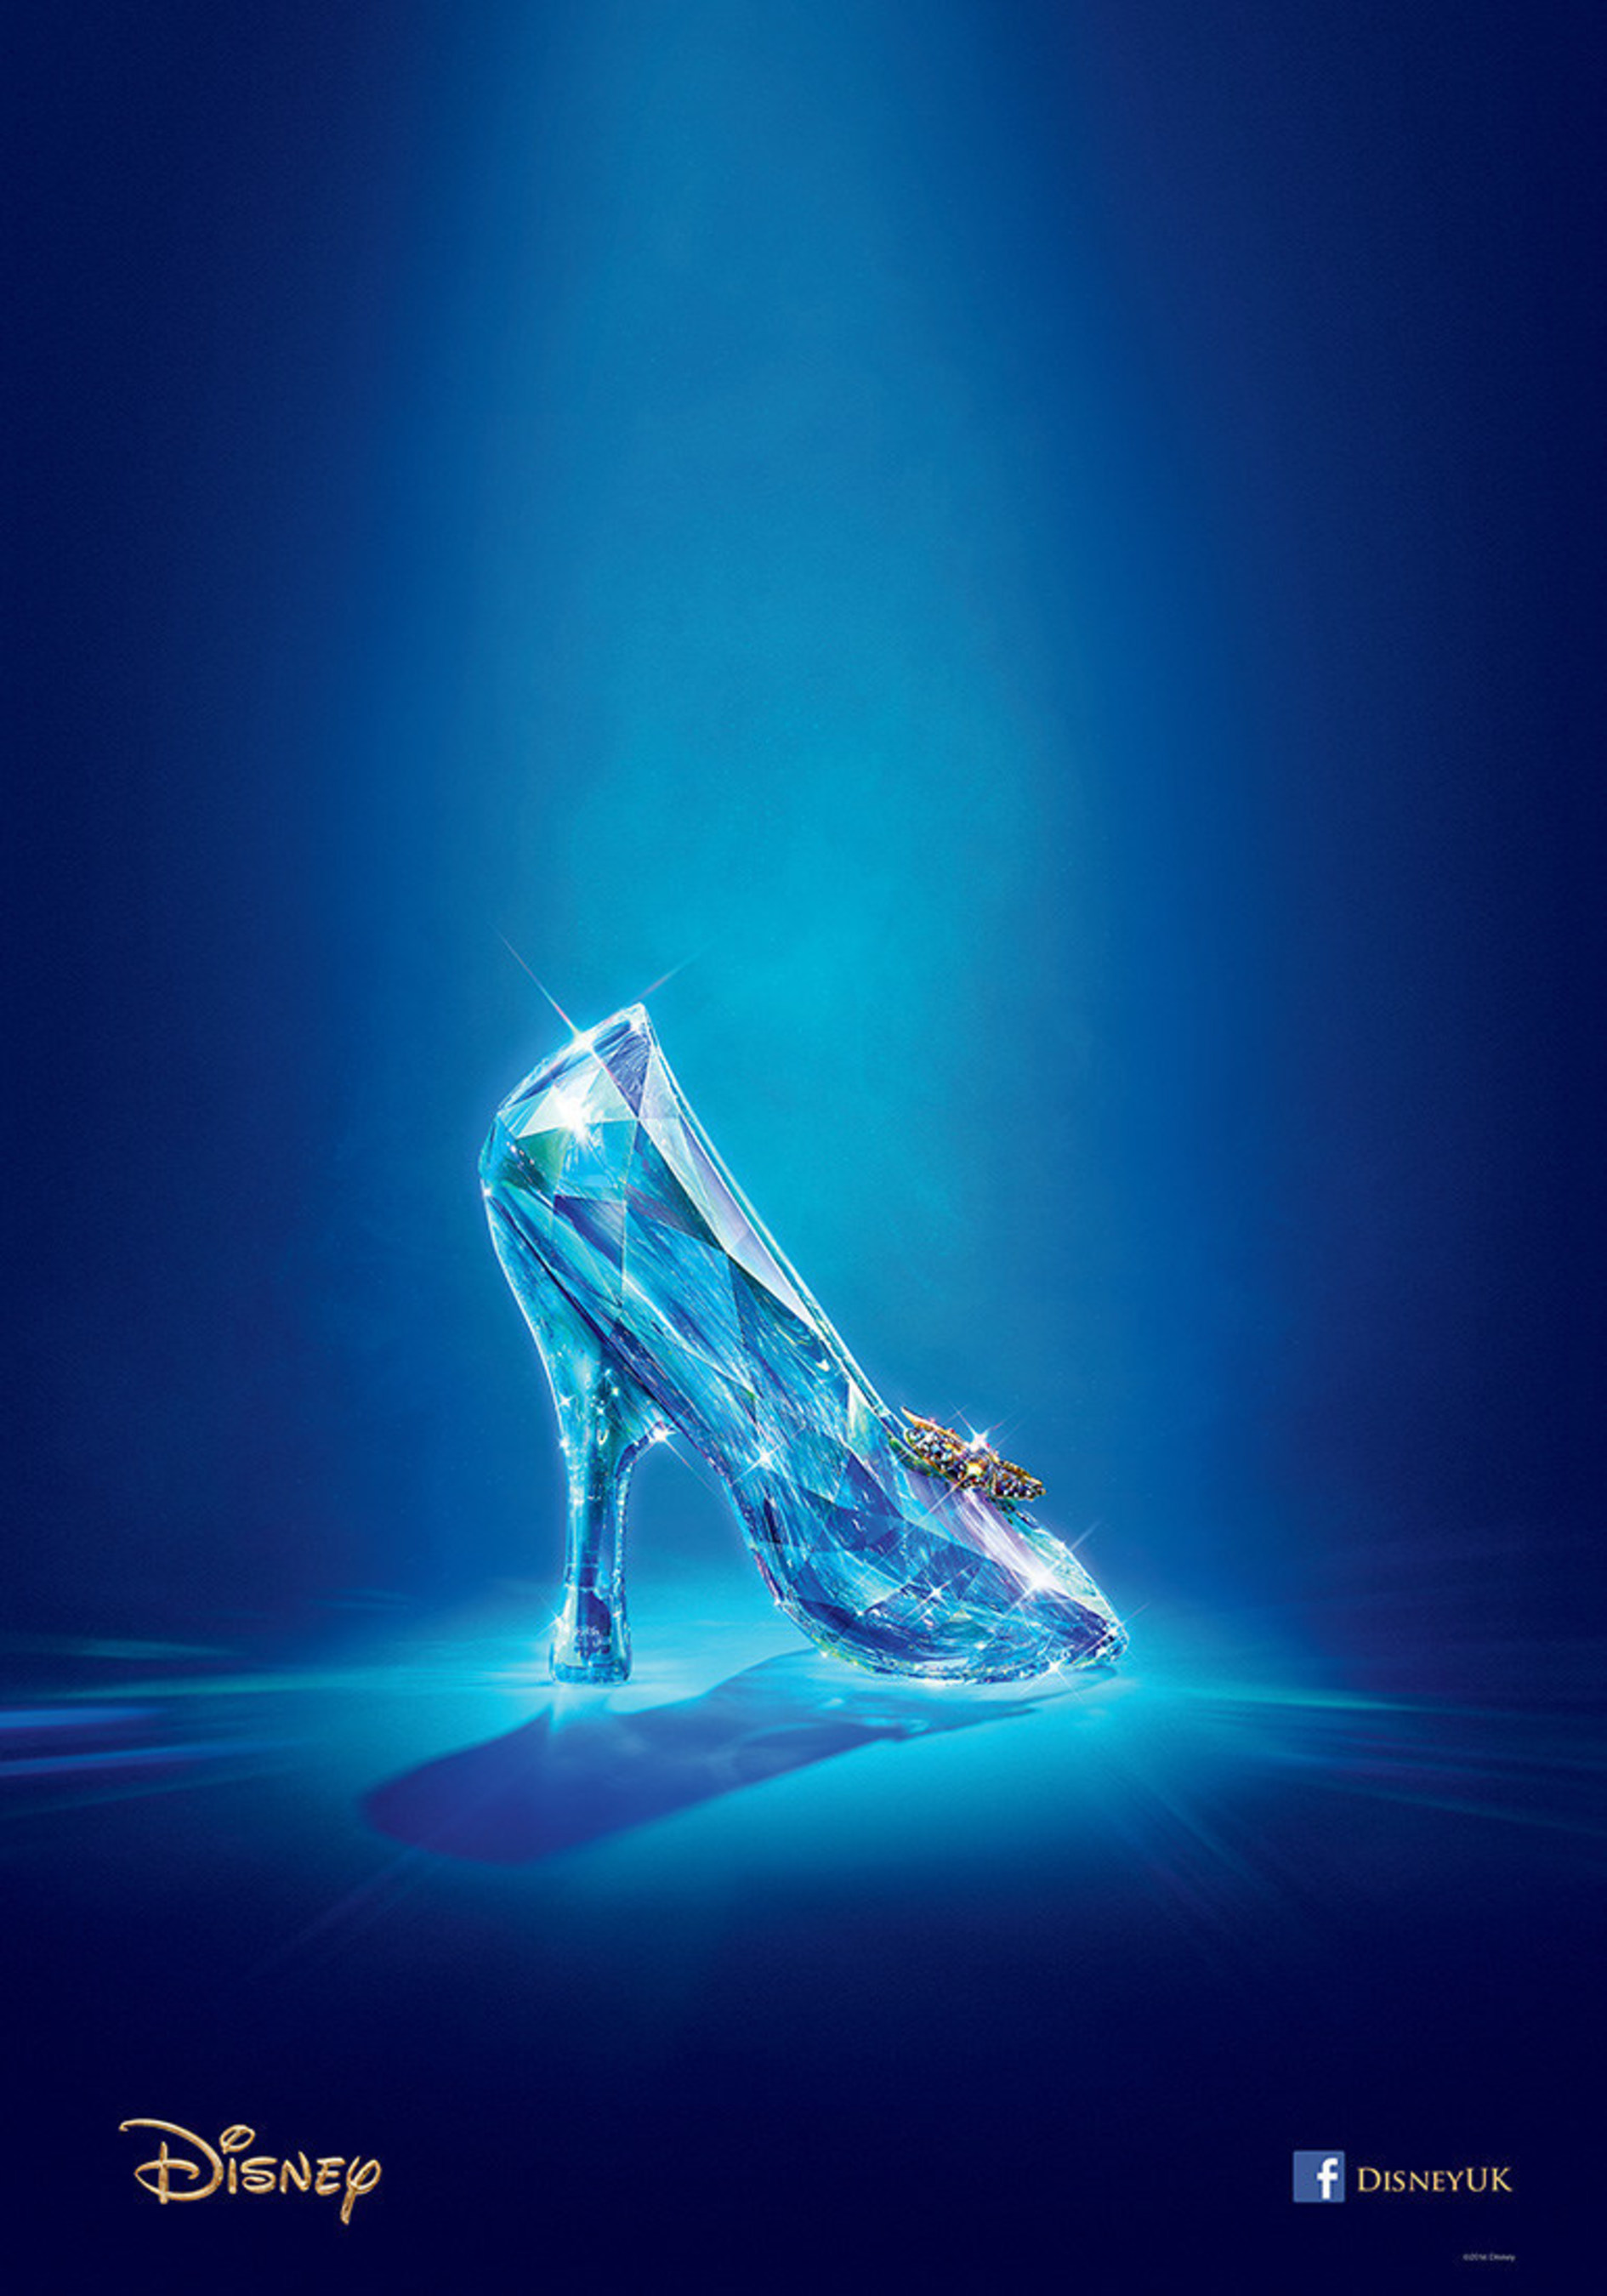 Cinderella slippers (c) 2014 Disney Enterprises, Inc. All Rights Reserved